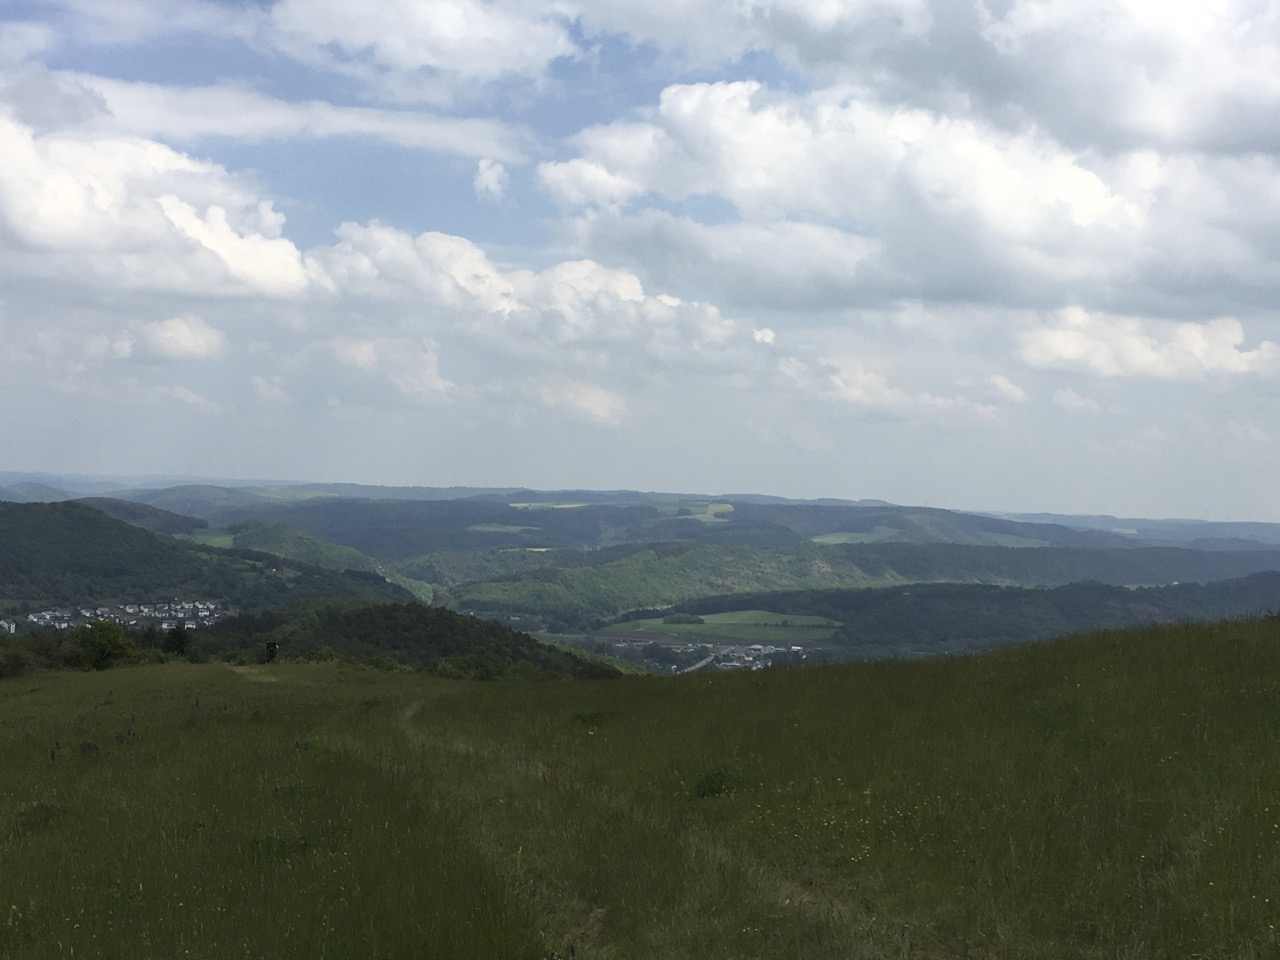 IdarOberstein4